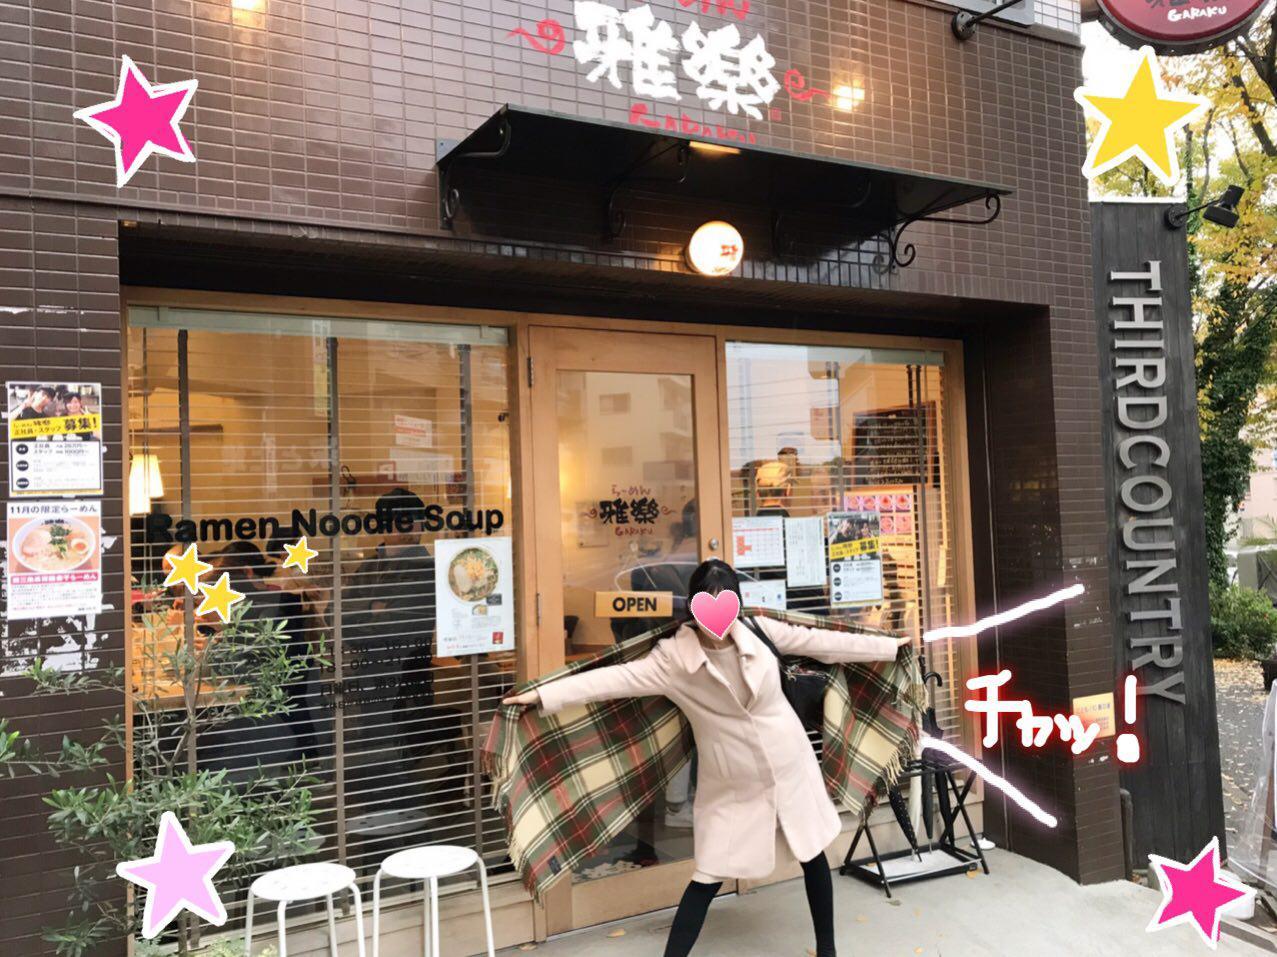 photo_2017-11-18_23-10-50.jpg